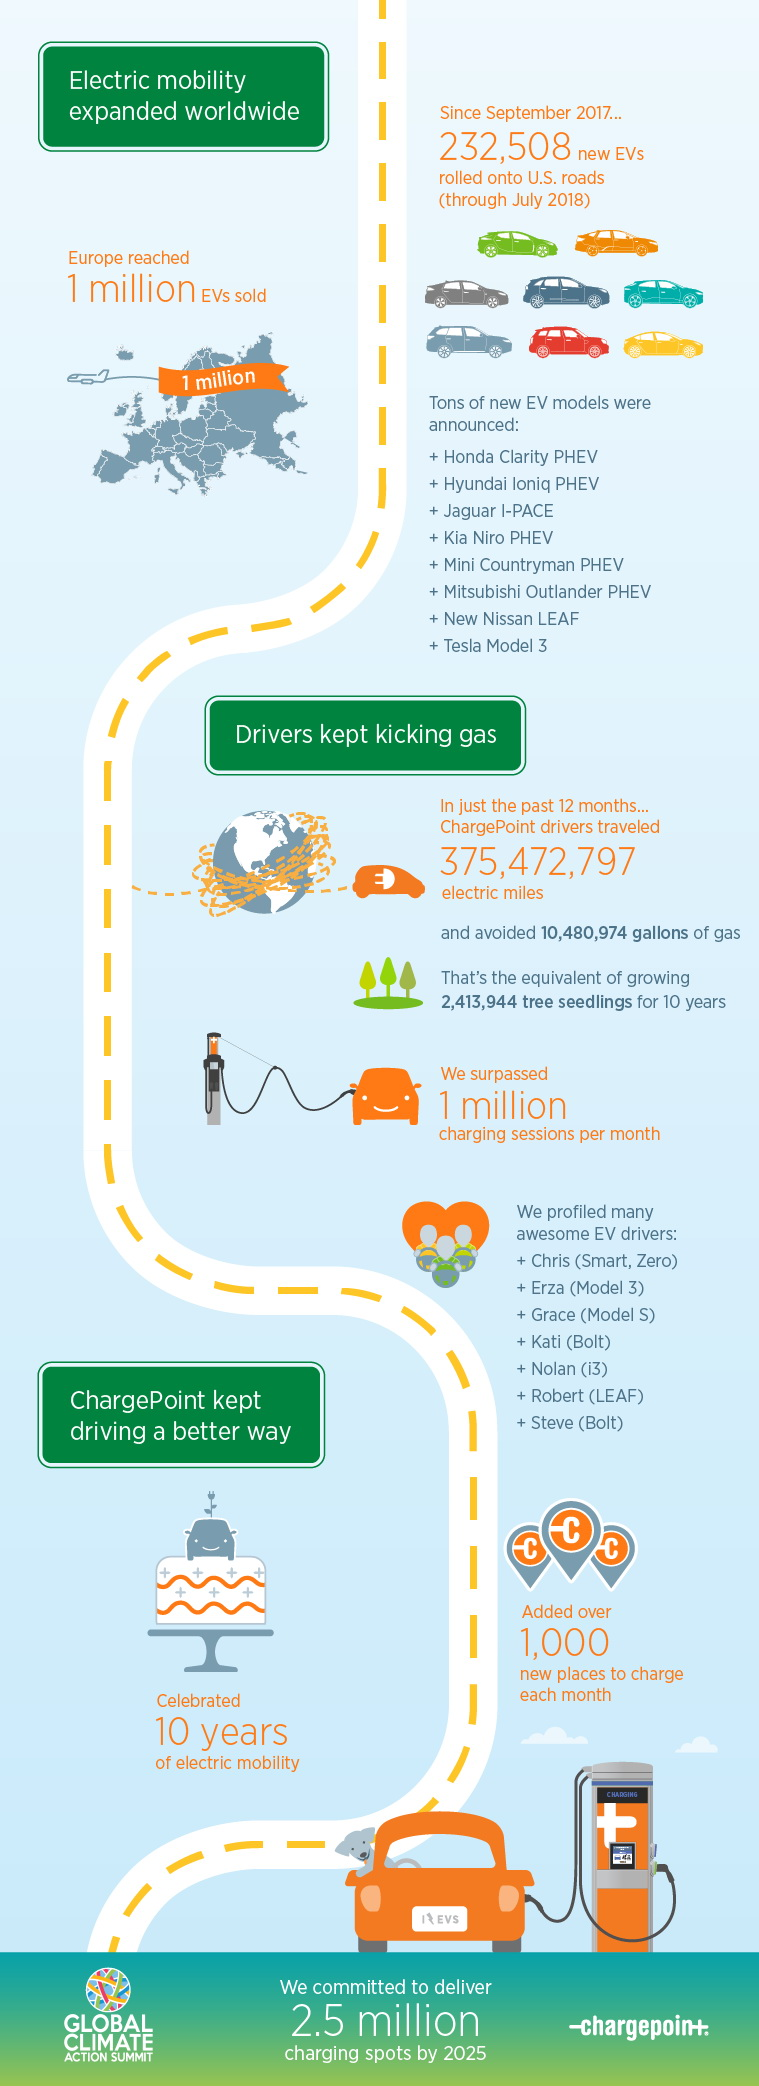 Инфографика зарядной сети ChargePoint